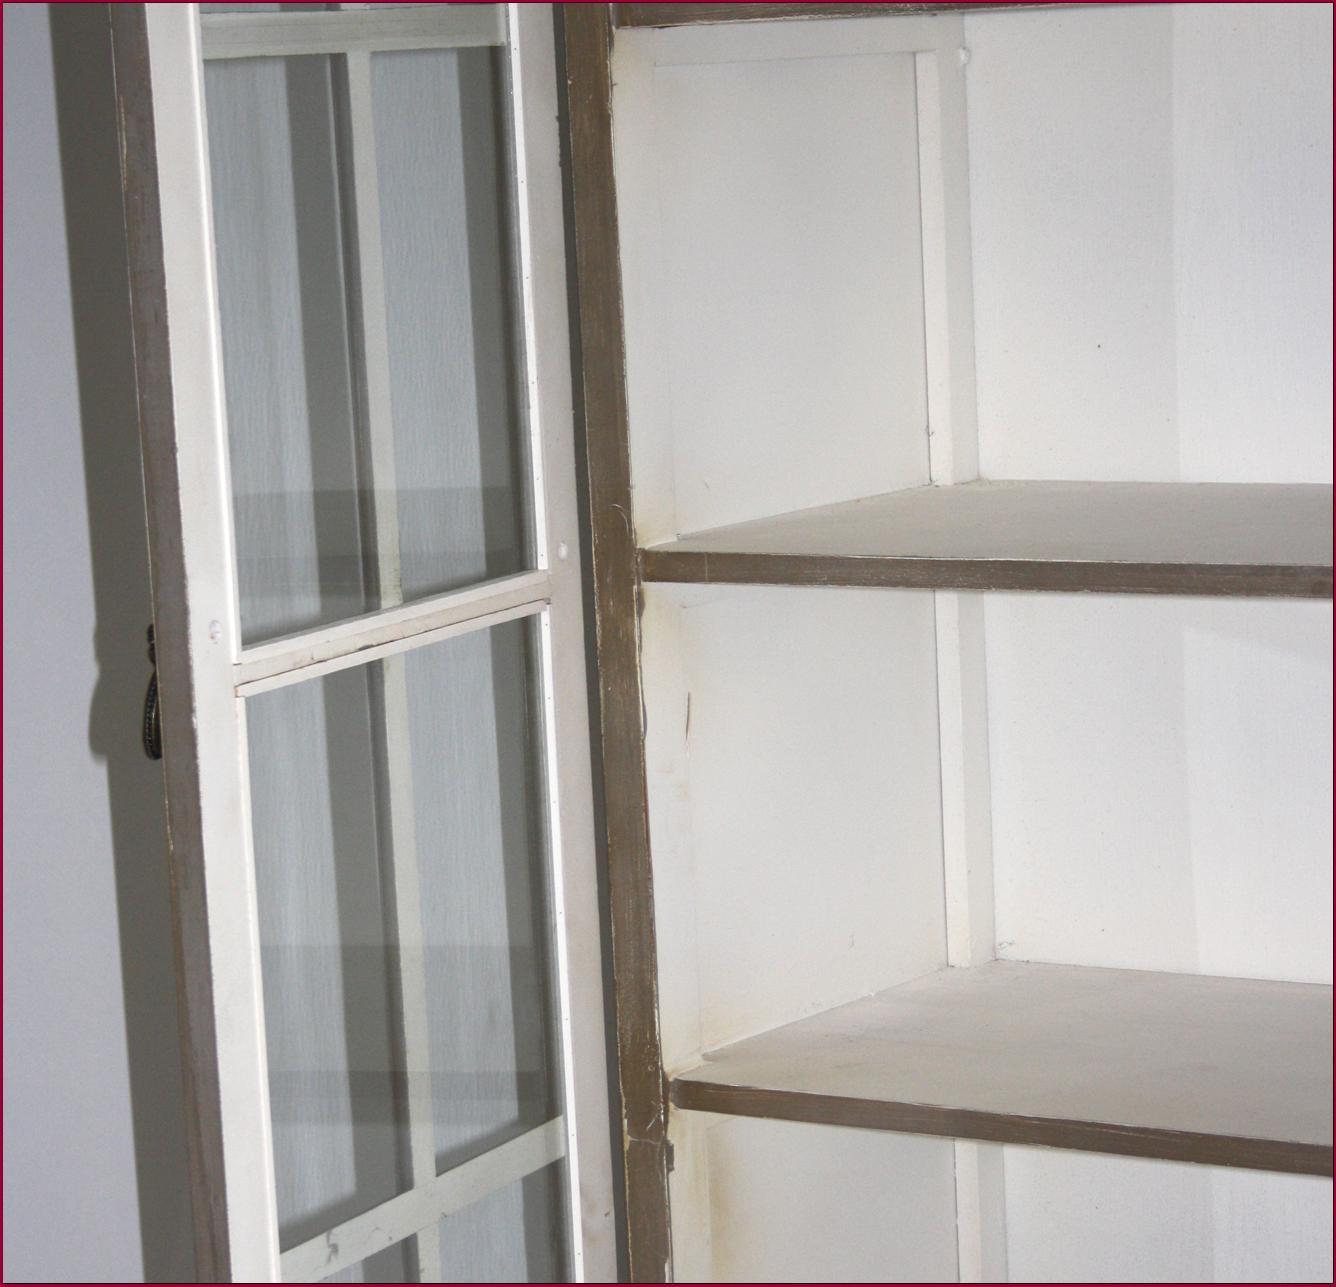 style ancien meuble vitrine bahut buffet vaisselier ebay. Black Bedroom Furniture Sets. Home Design Ideas